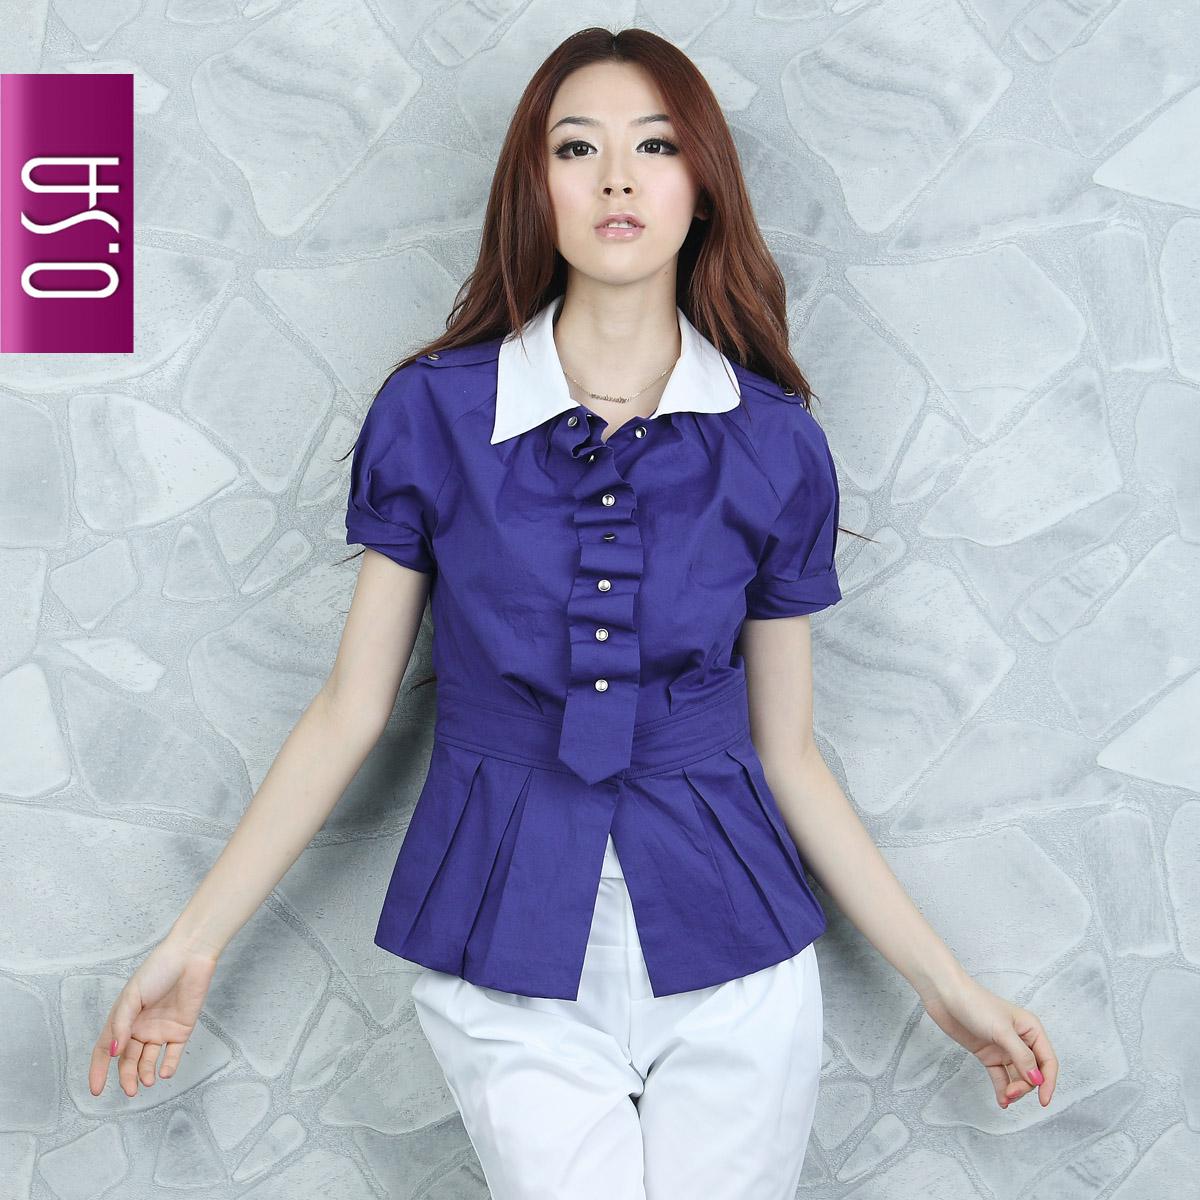 женская рубашка OSA sc00304 O.SA OL